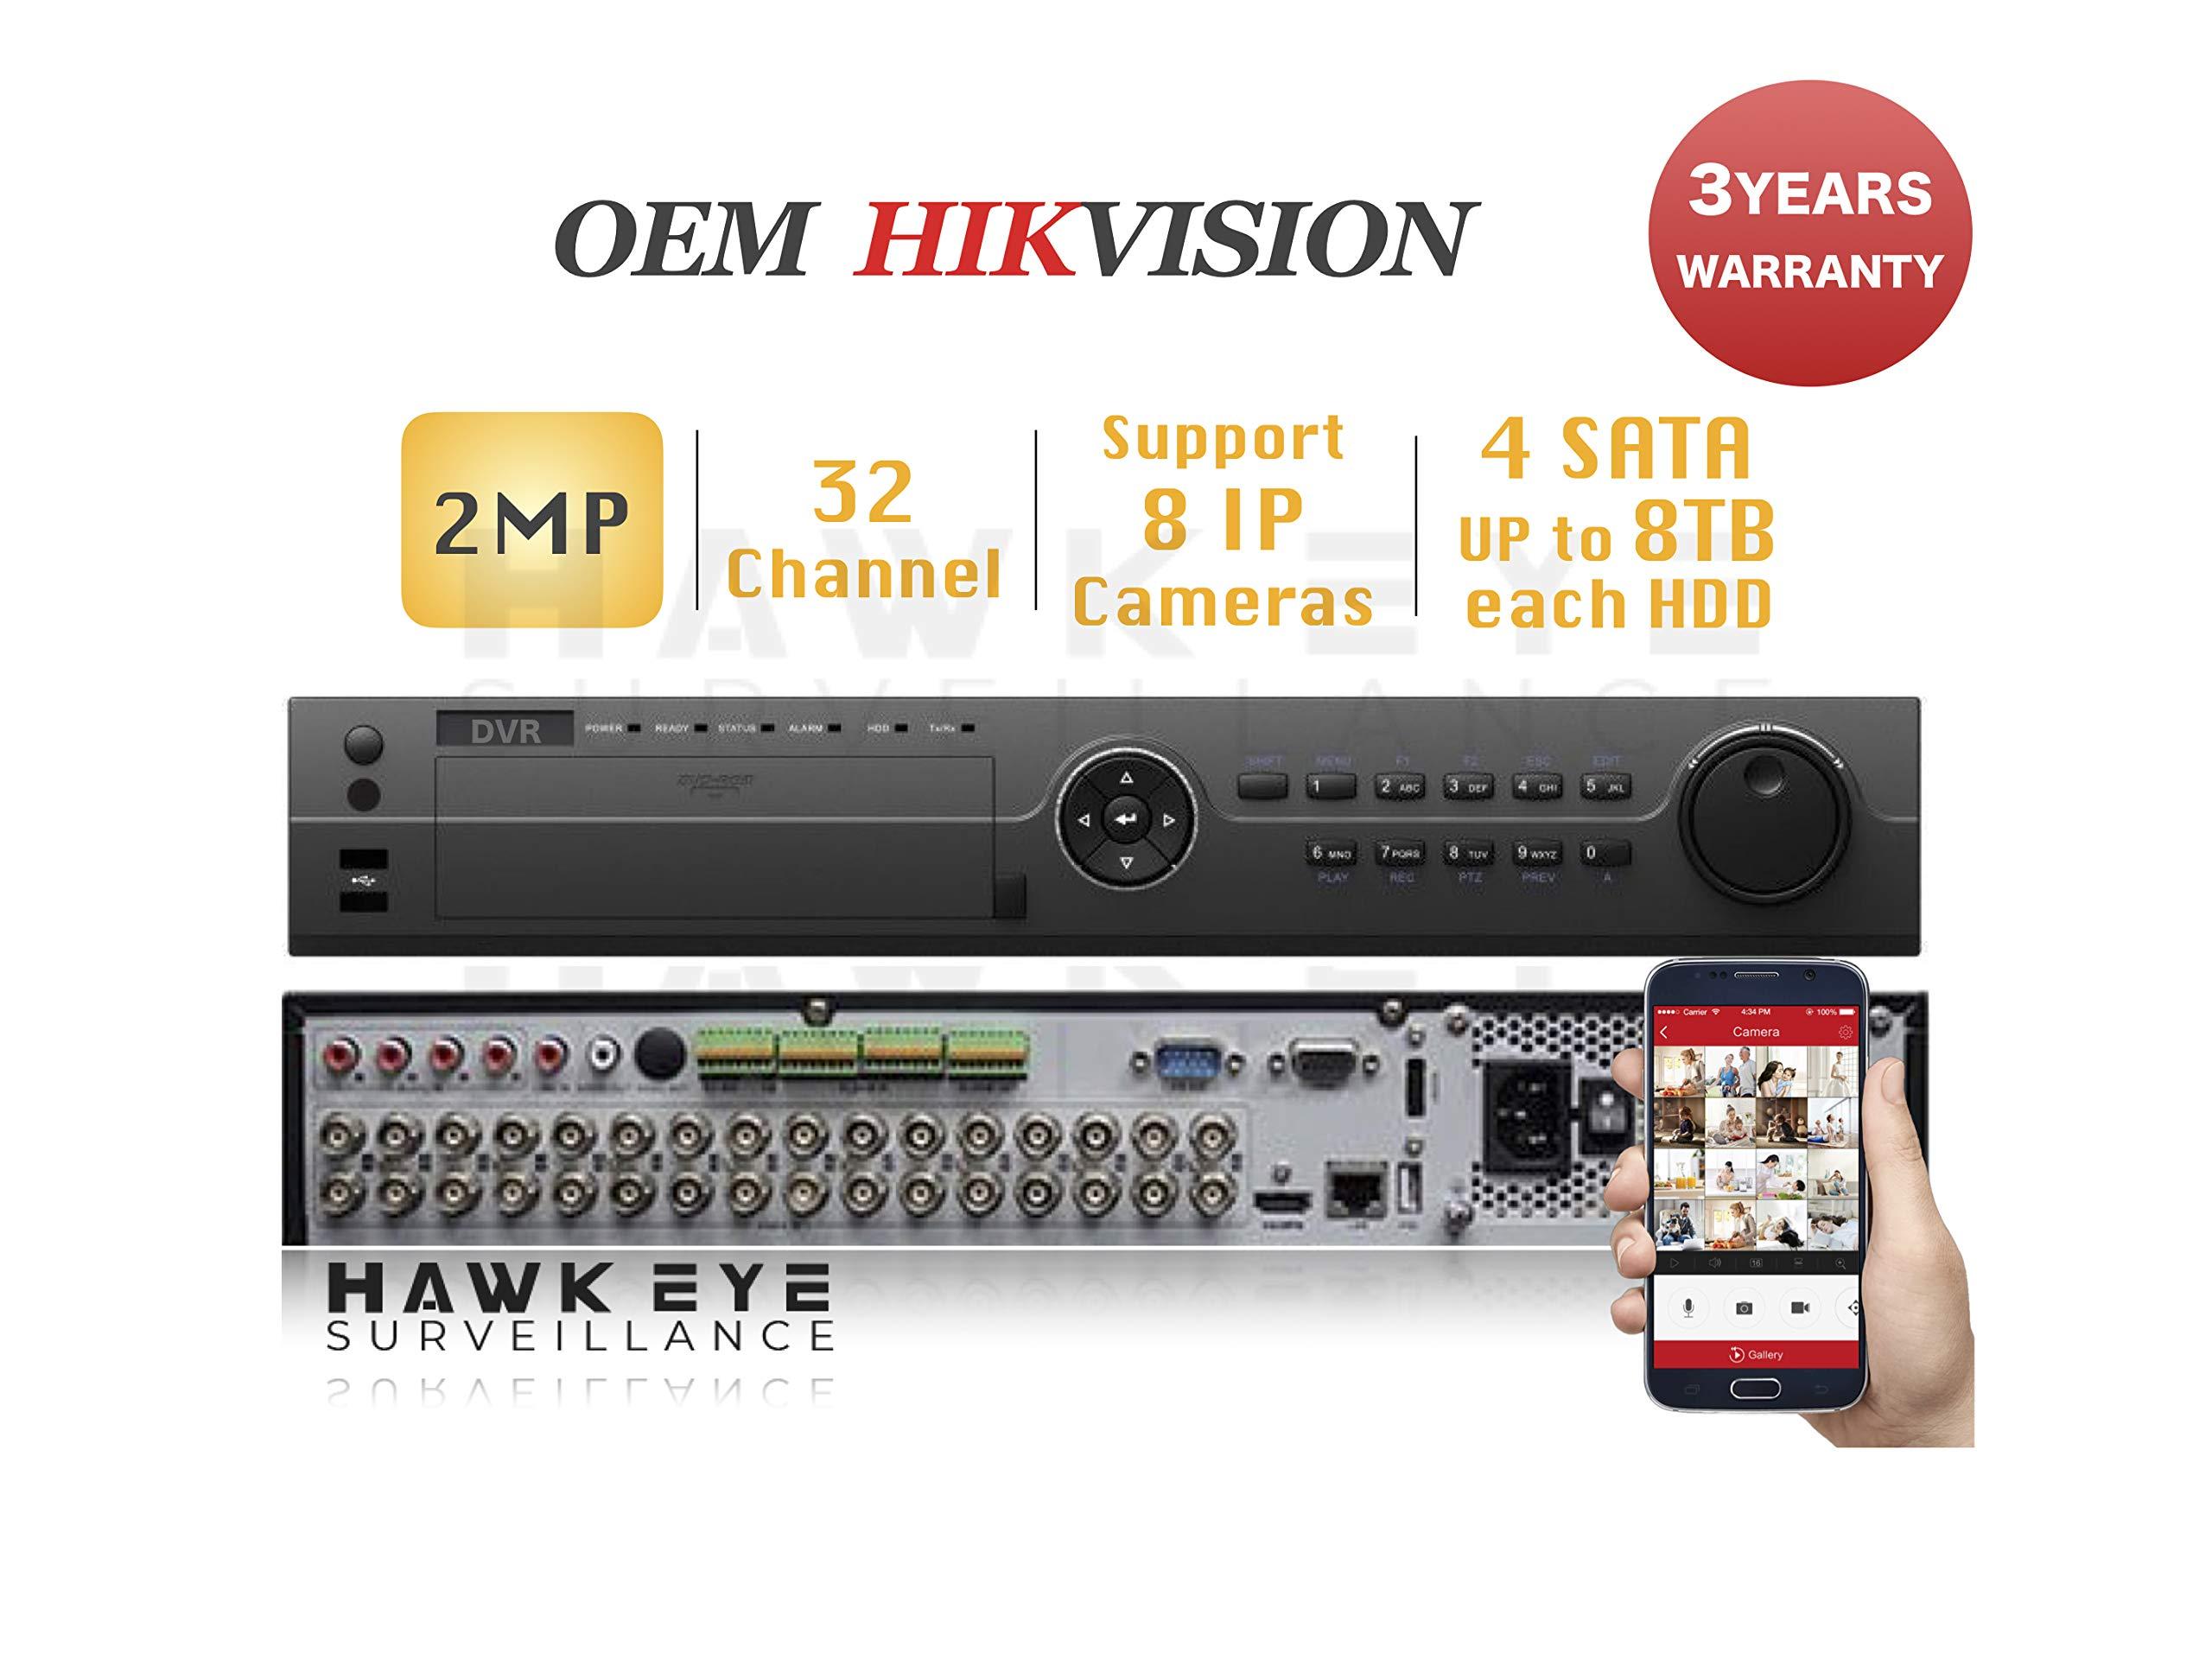 32CH HD TVI 1080P DVR - Surveillance Digital Video Recorder 32CH HD-TVI/CVI/AHD H264 Full-HD HDMI/VGA/BNC Video Output for Home & Business Analog& IP Camera Support Mobile App 3year Warranty by HAWK EYE SURVEILLANCE